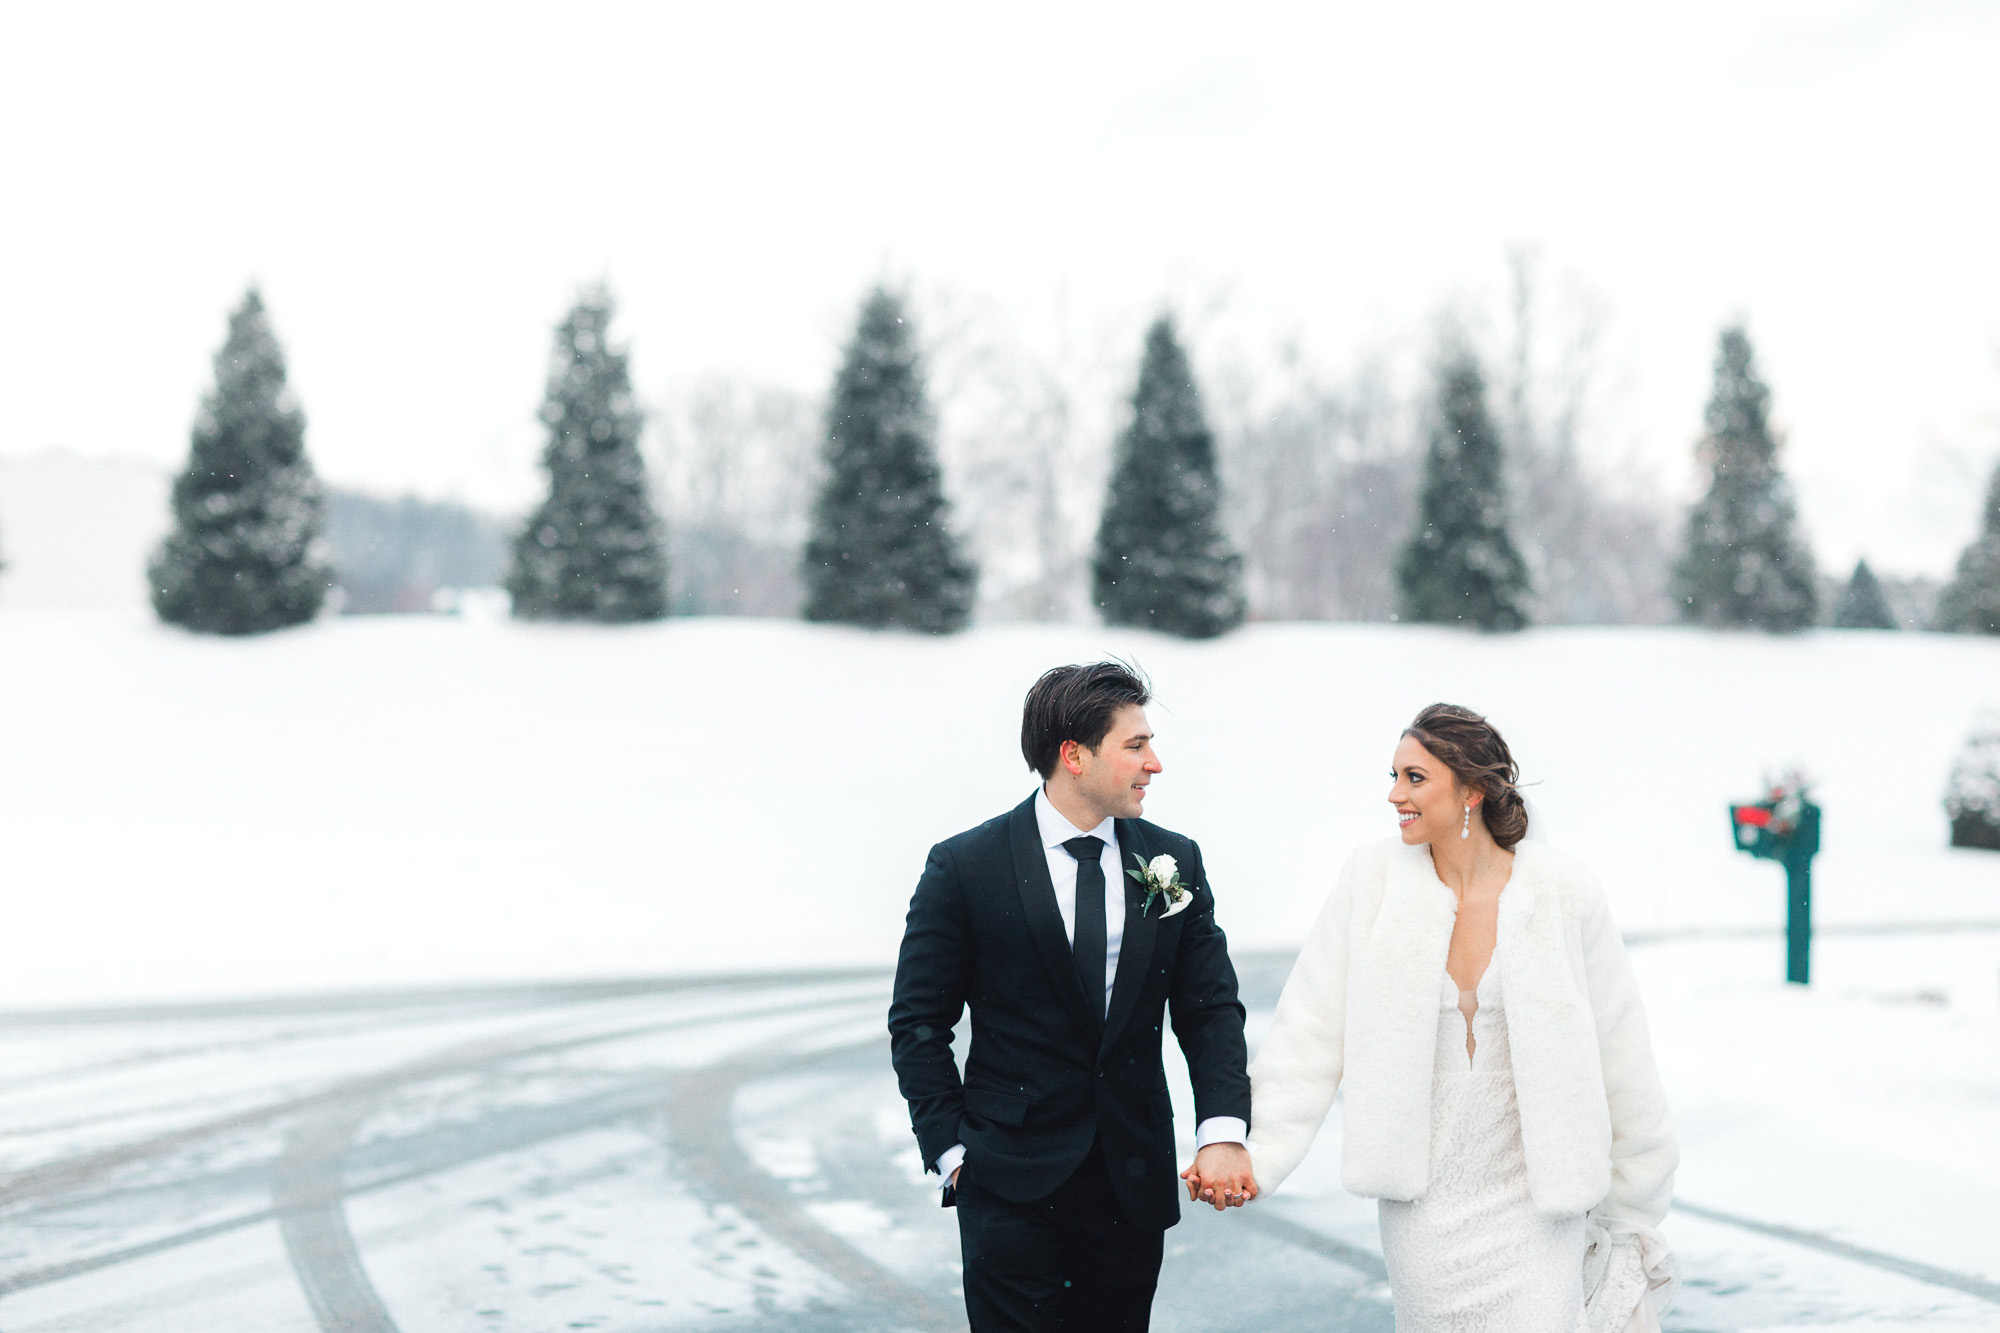 snowy-sand-springs-country-club-drums-pa-christmas-wedding-24805.jpg